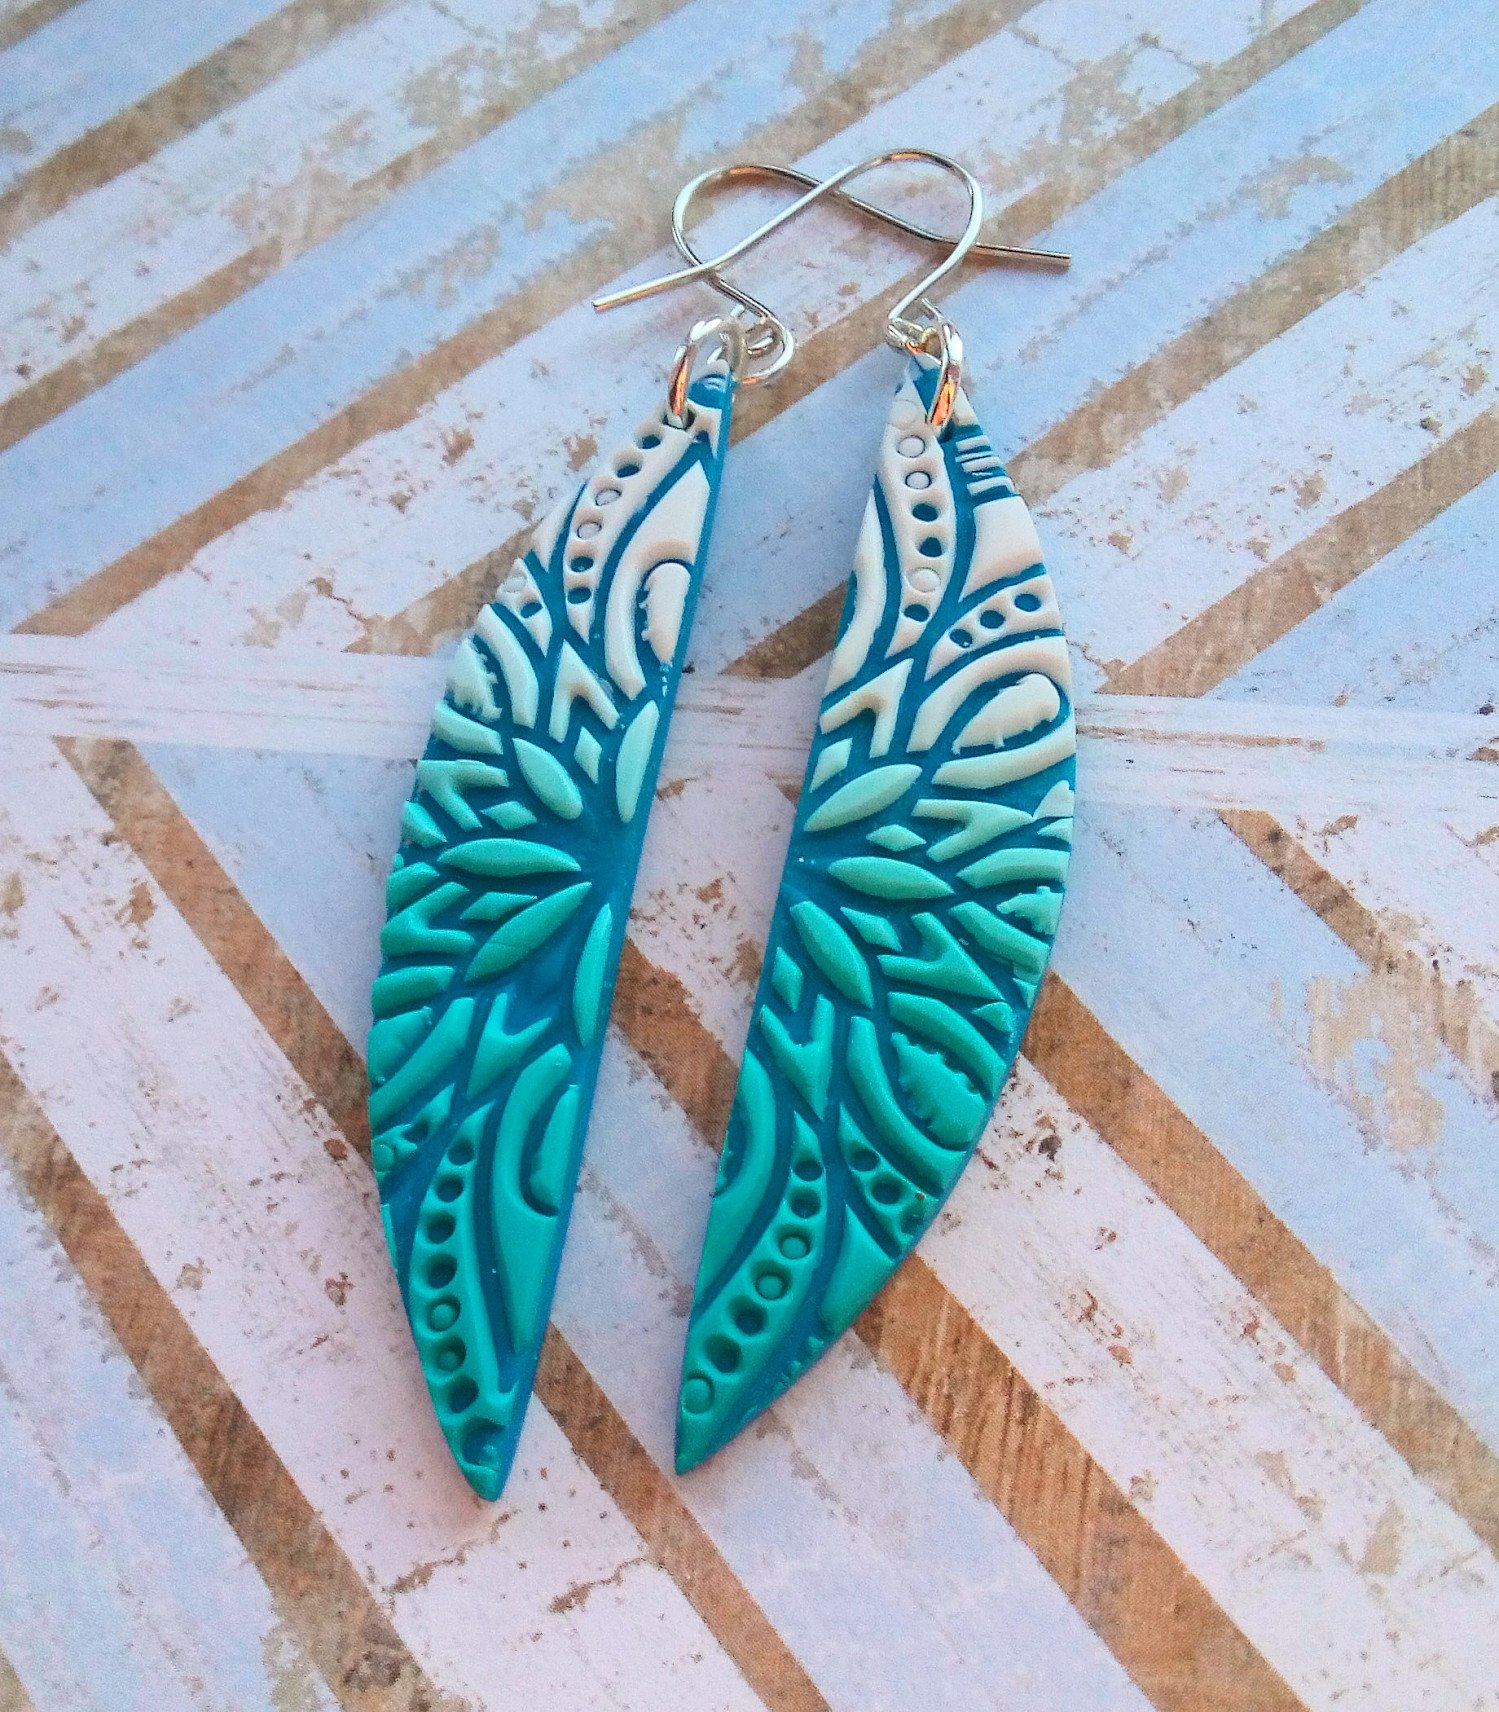 New listing, handmade mandala earrings